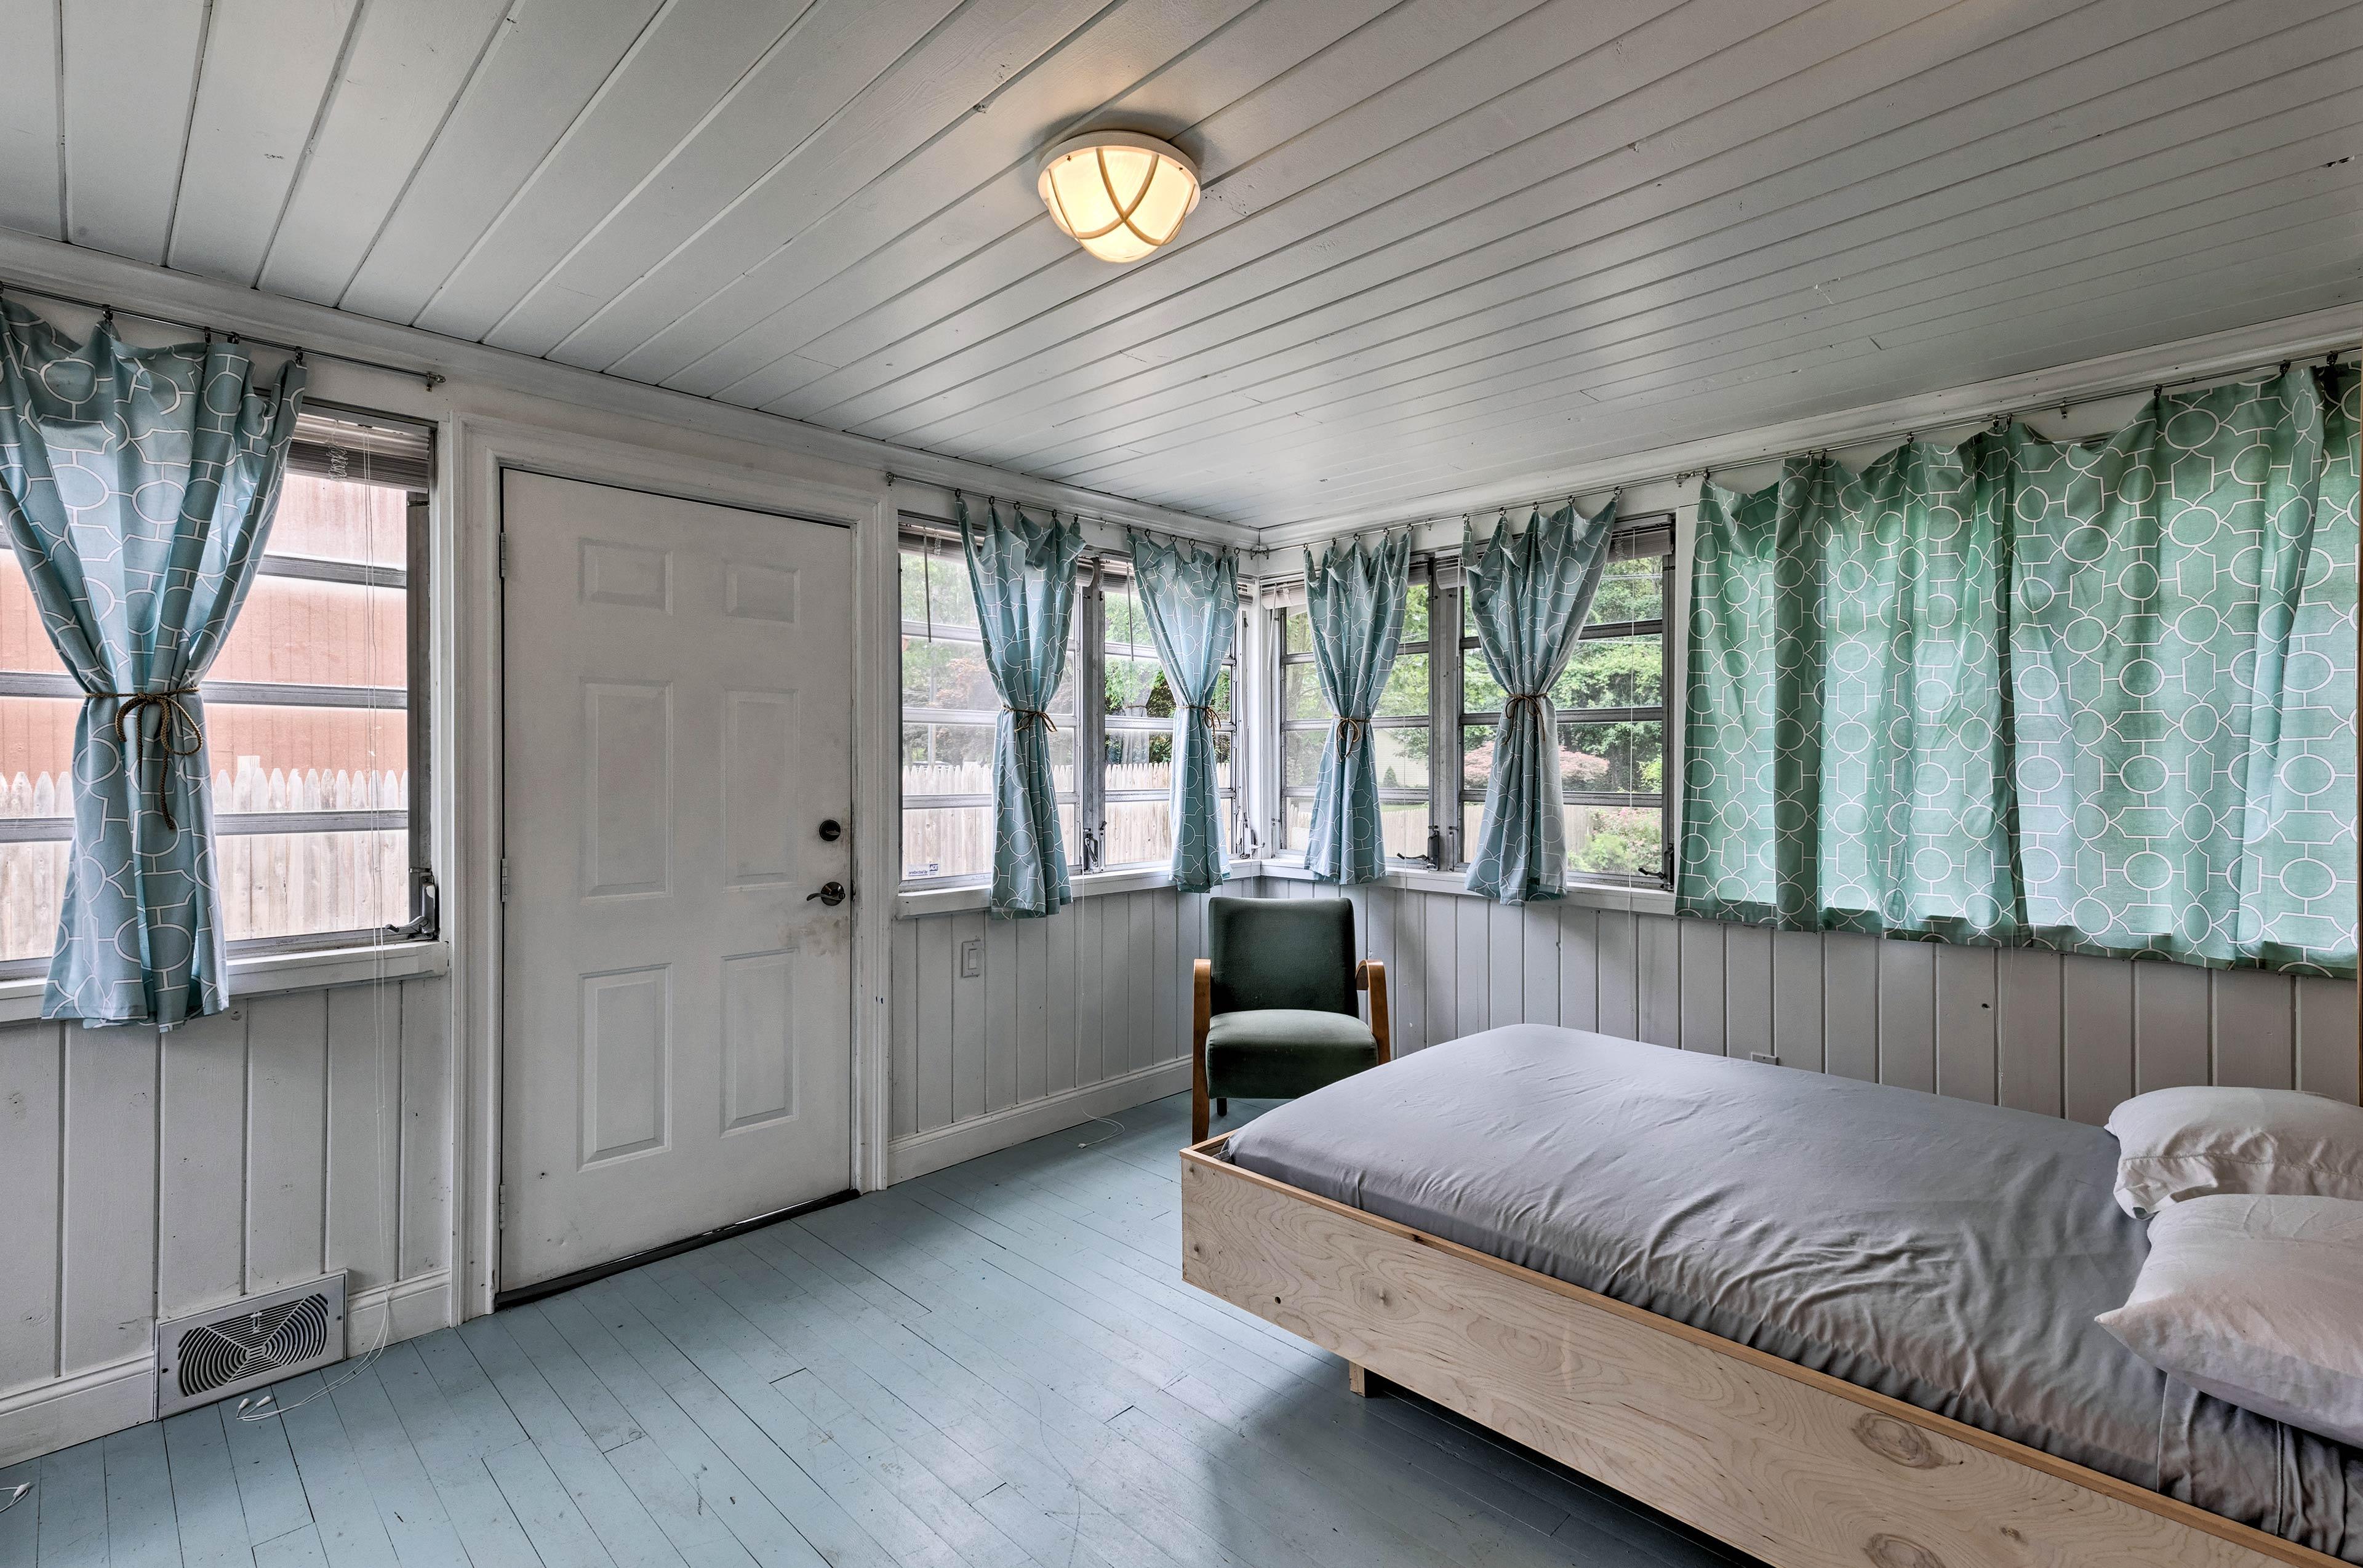 Windows surround this room.